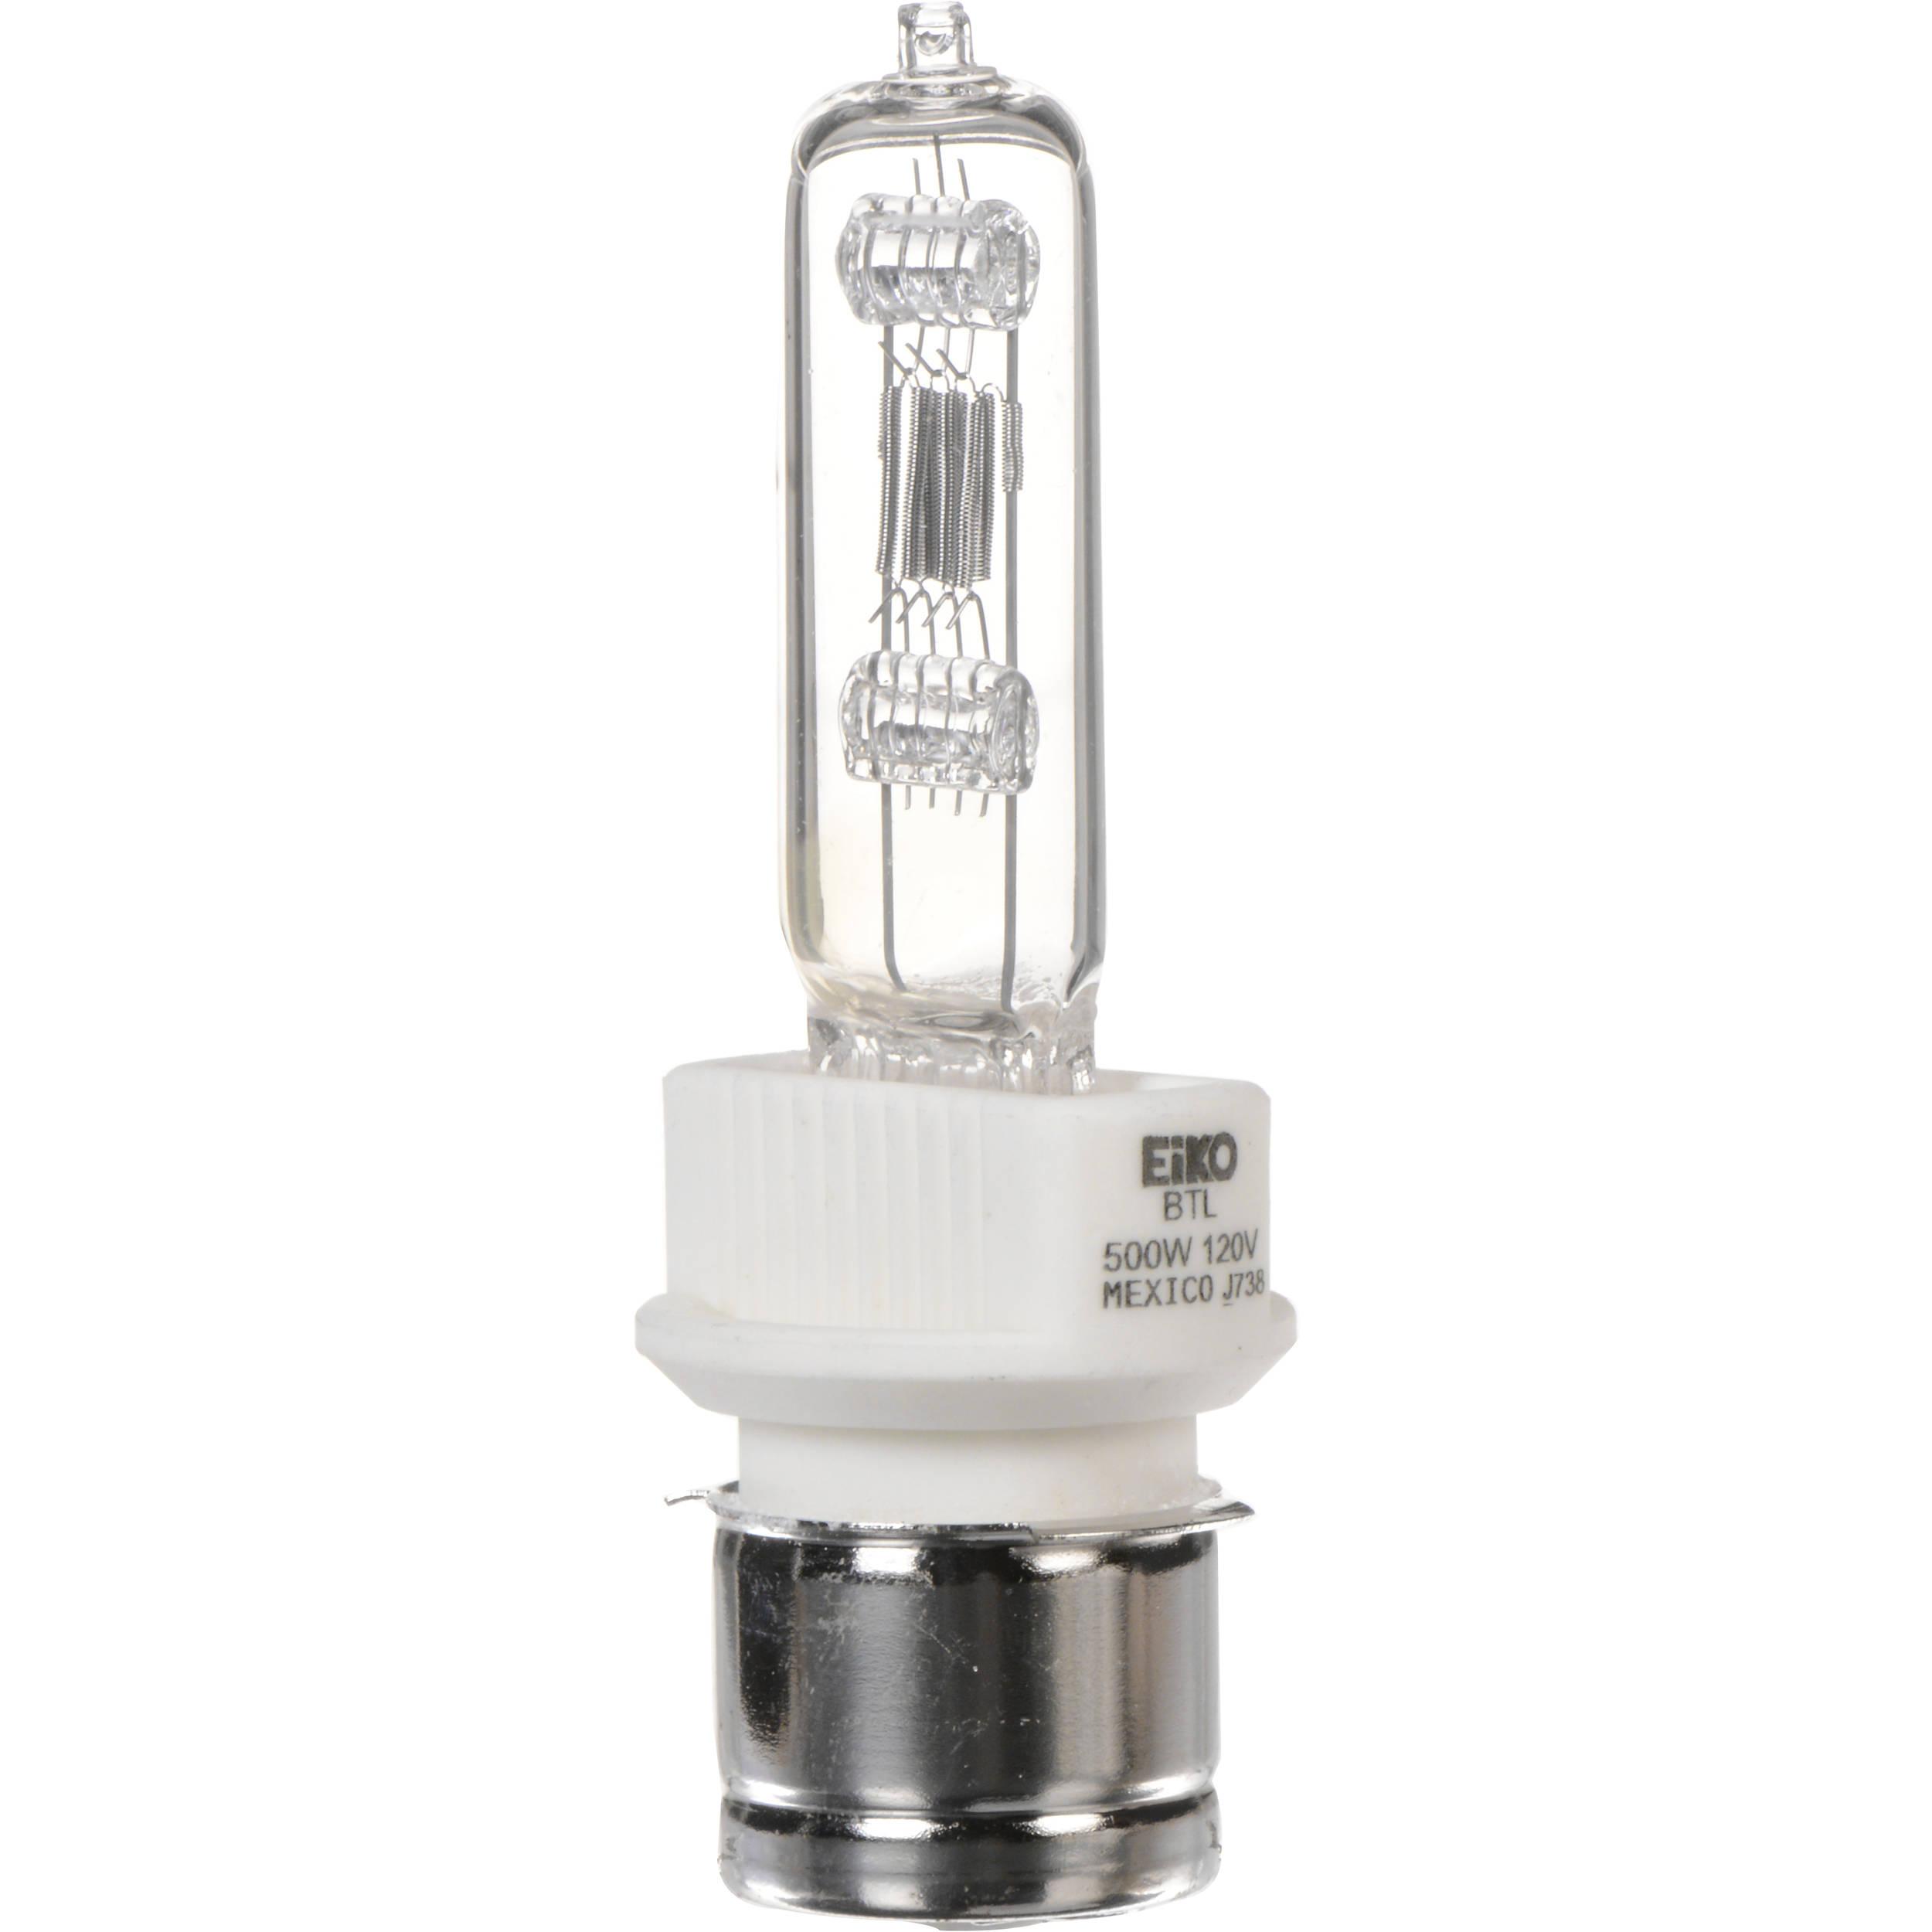 EIKO BTL EIKO 500W T6 Halogen Reflector Light Bulb